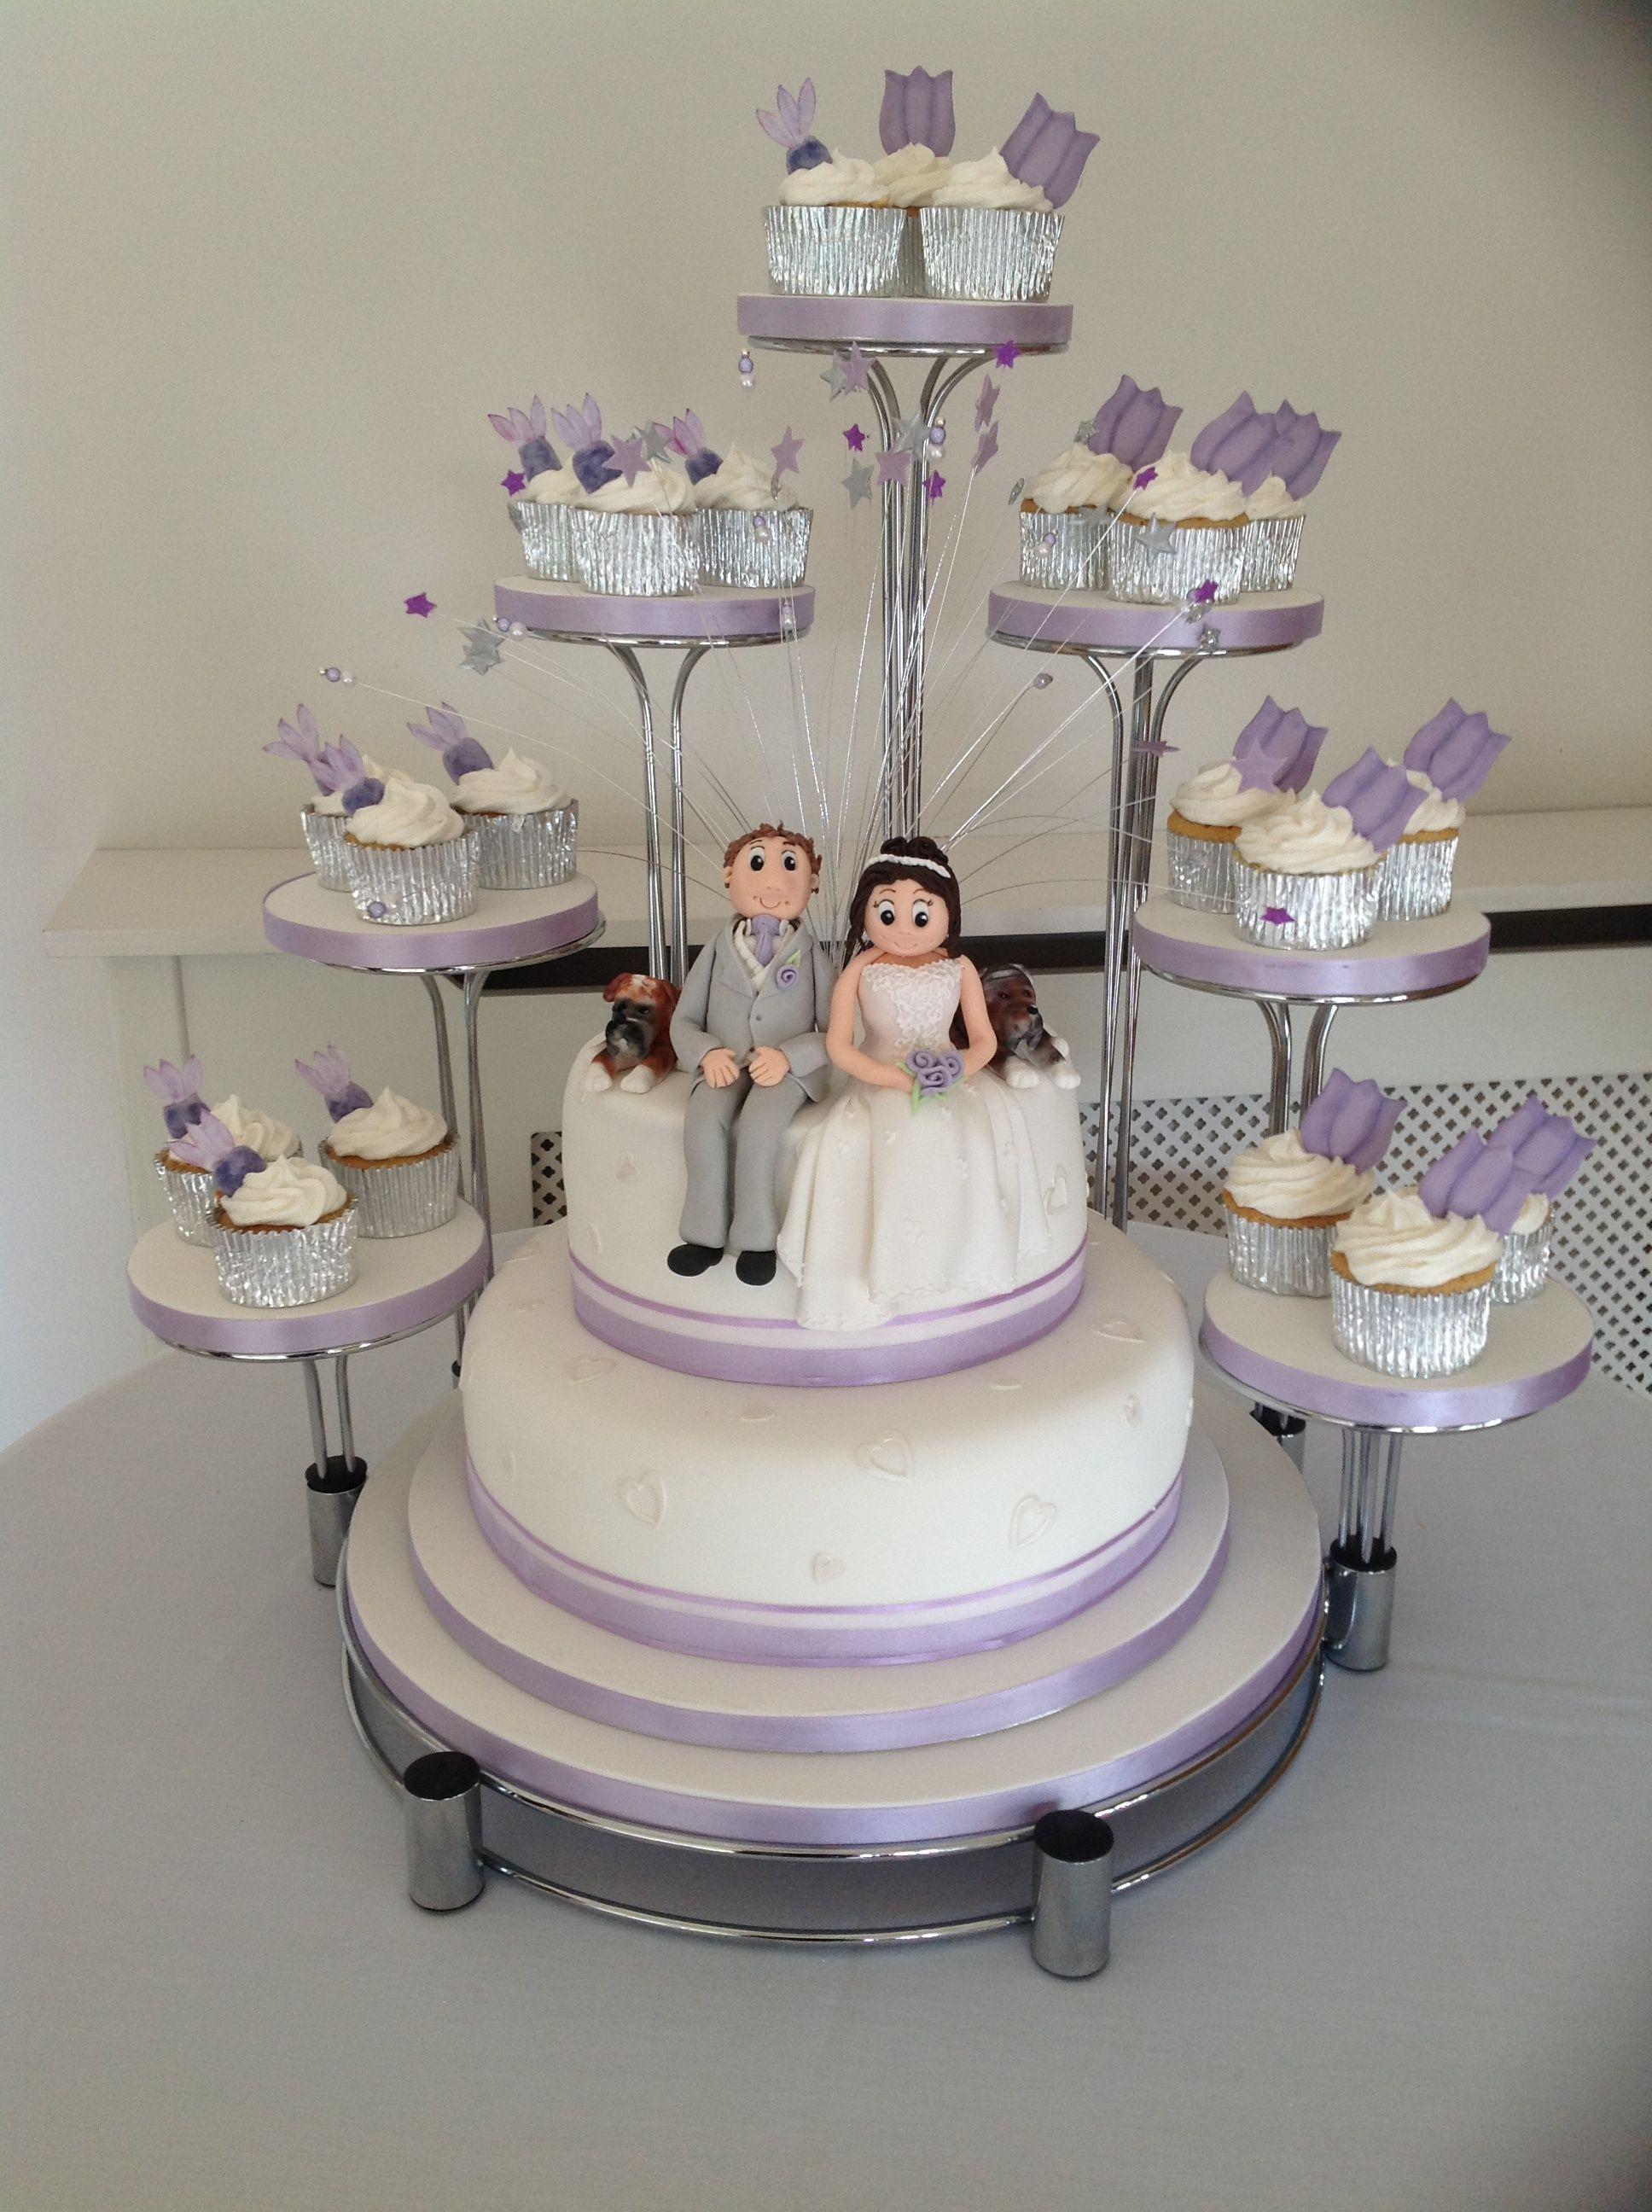 Lilac Themed Kara Design Wedding Cake Incorporating Personalised